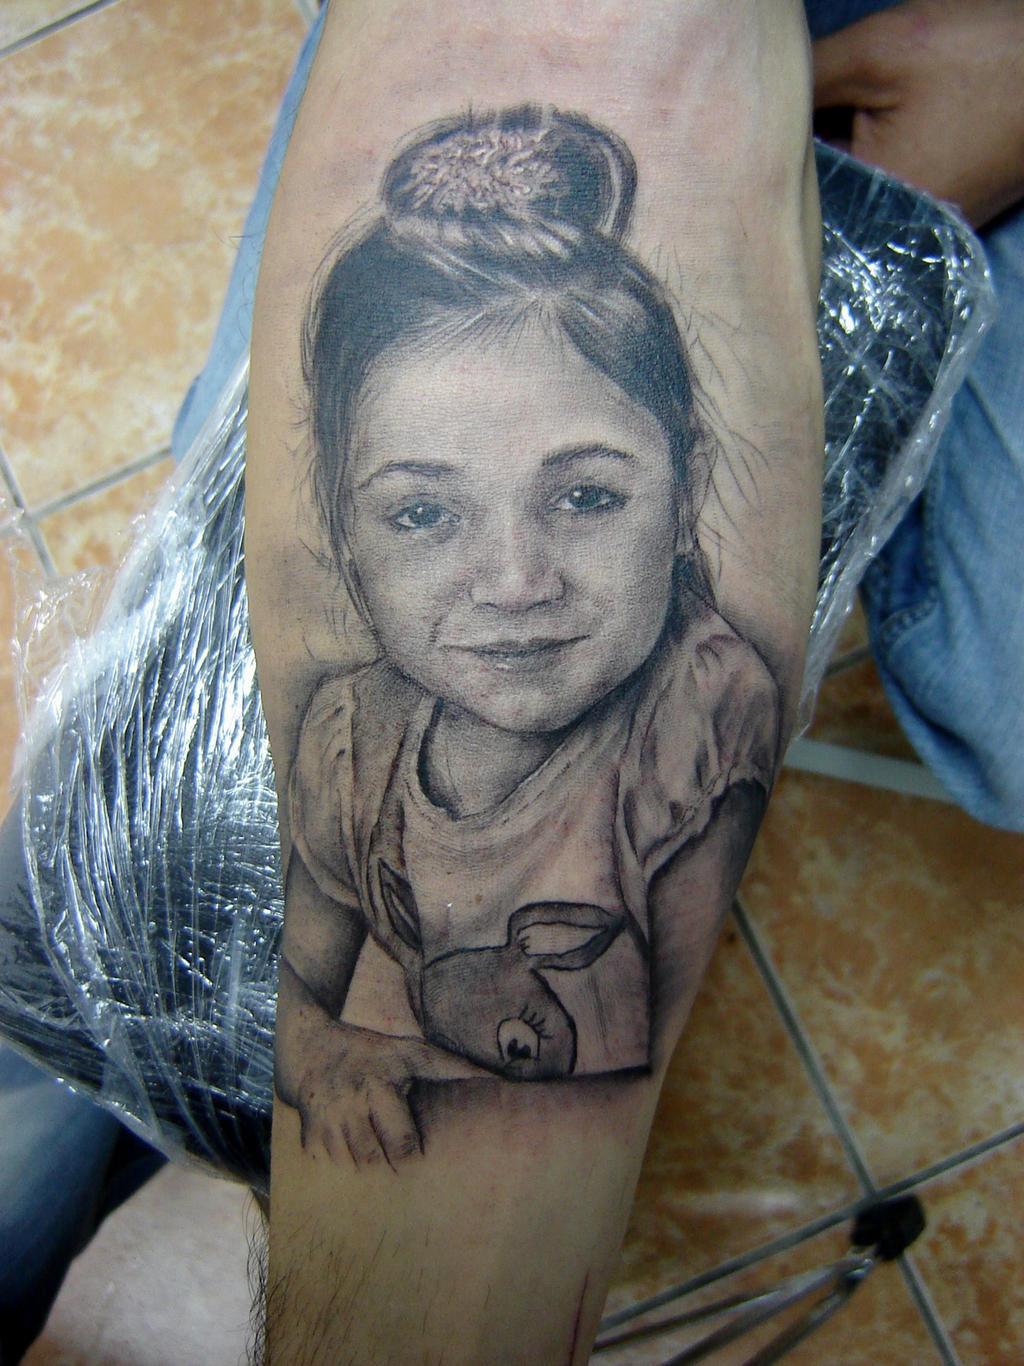 Portret tattoo by slakitattoo on deviantart for Tattoo shops terre haute indiana